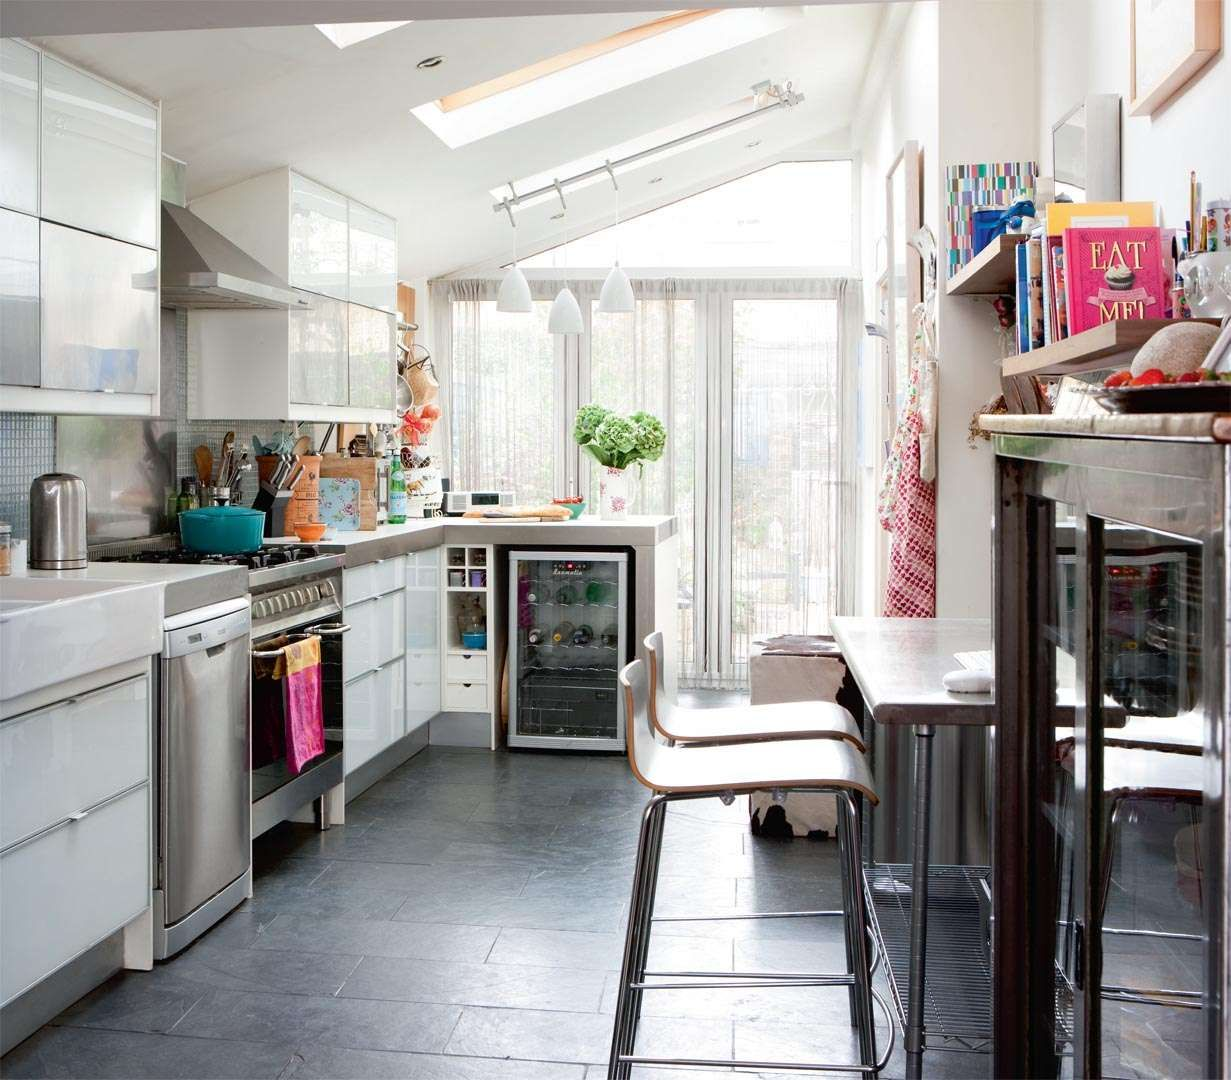 Victorian maisonette transformation | Real Homes, using side return ...